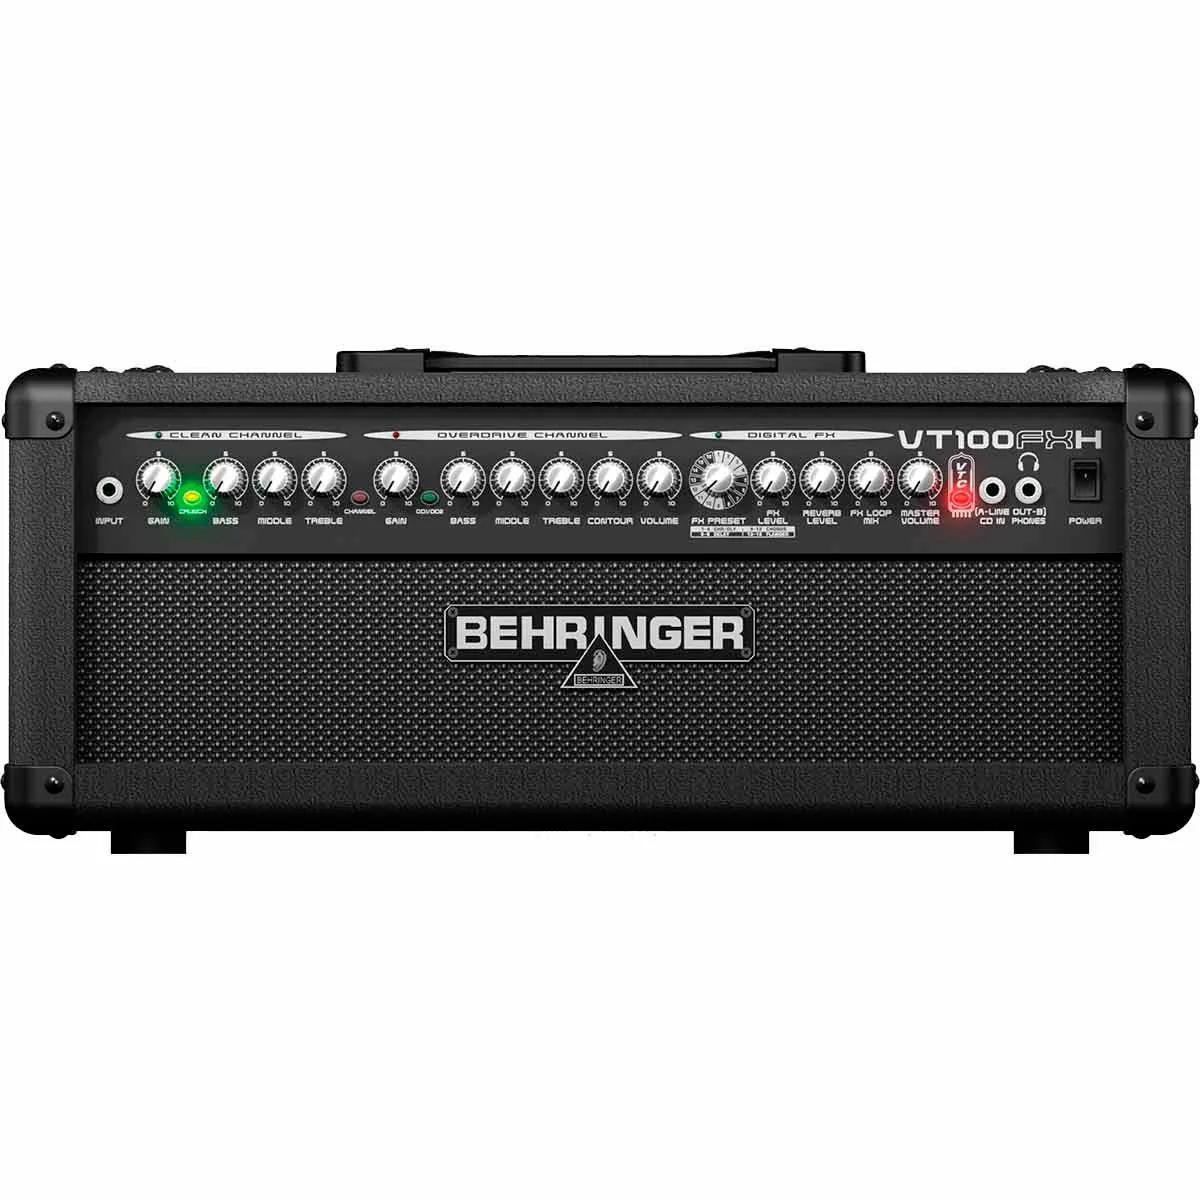 Amplificador Cabeçote Behringer Virtube VT100FXH 100W para Guitarra